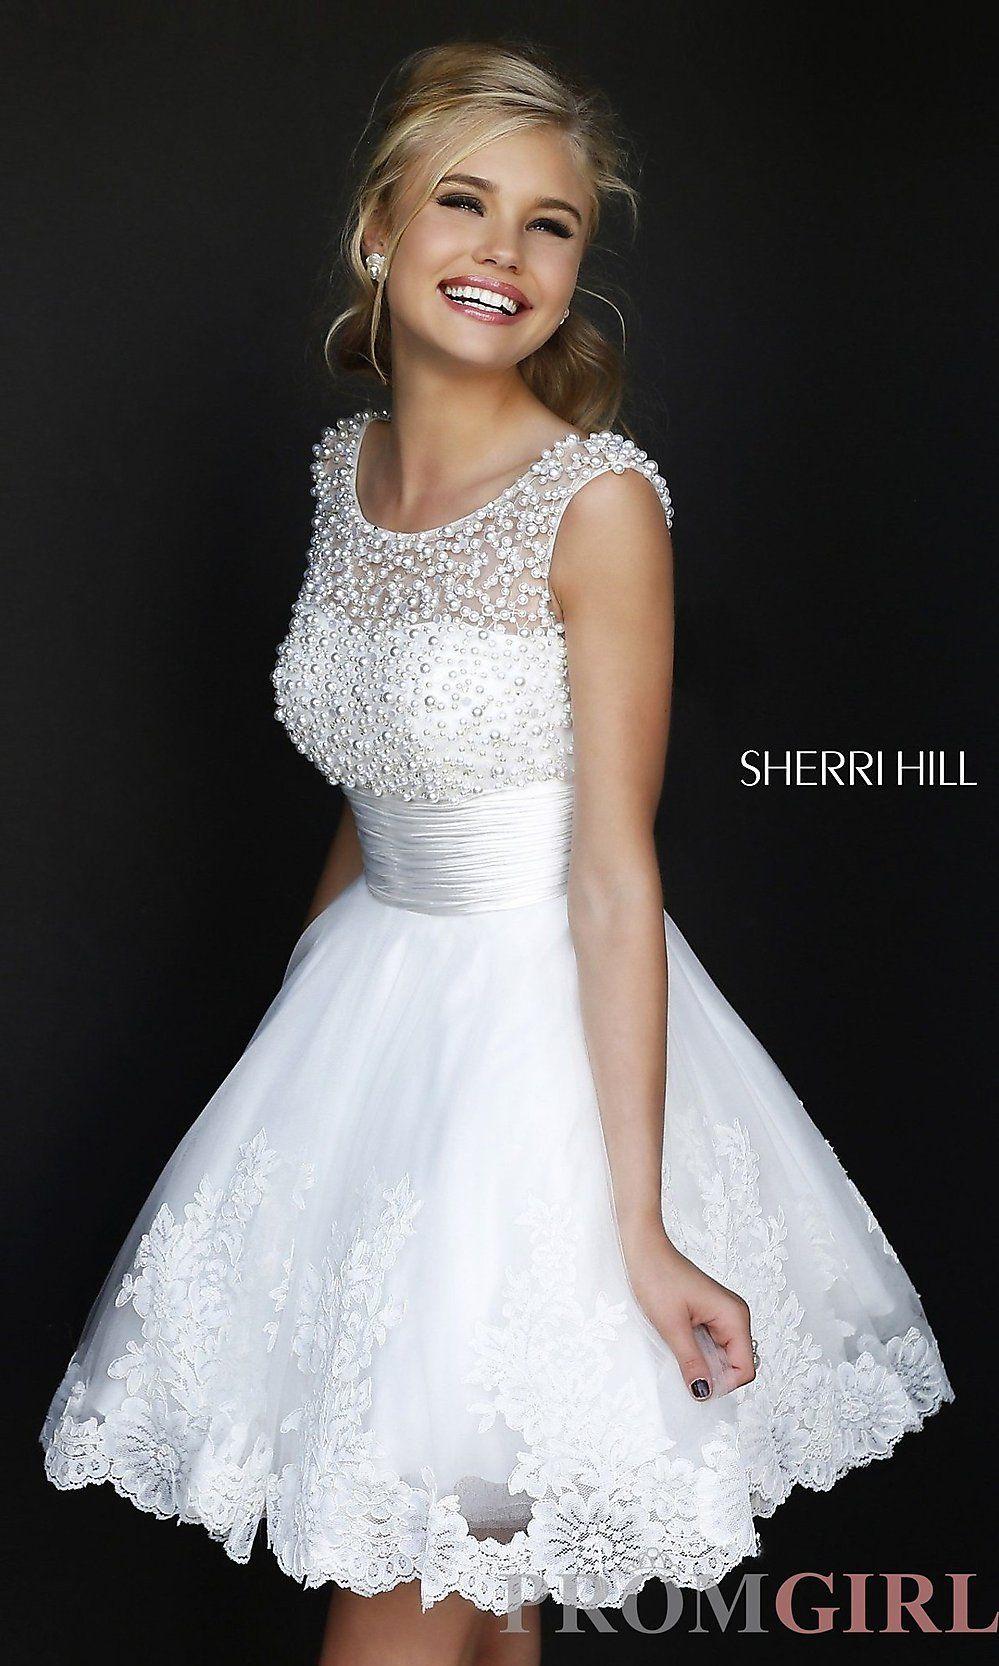 Sherri hill lace wedding dress  Short High Neck White Sherri Hill Dress  dresses  Pinterest